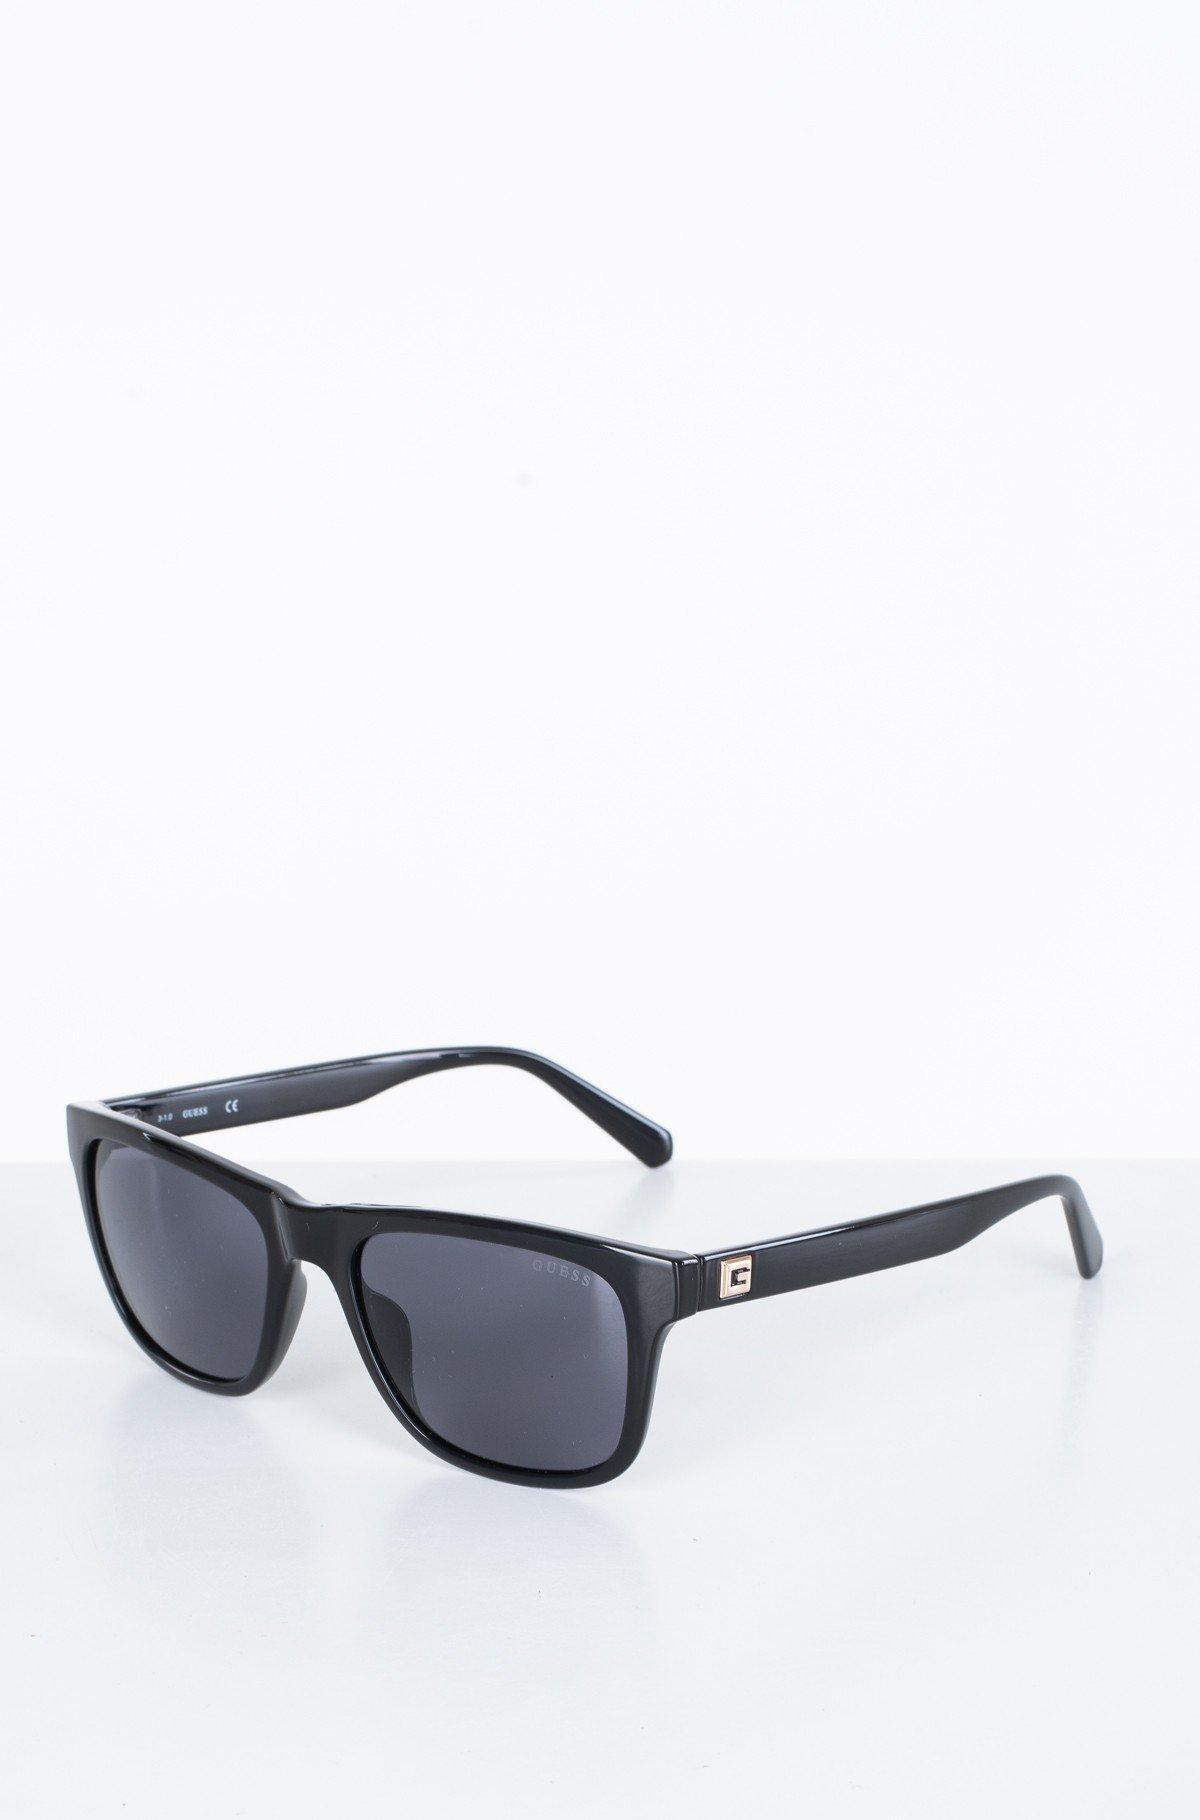 Sunglasses 6971-full-2